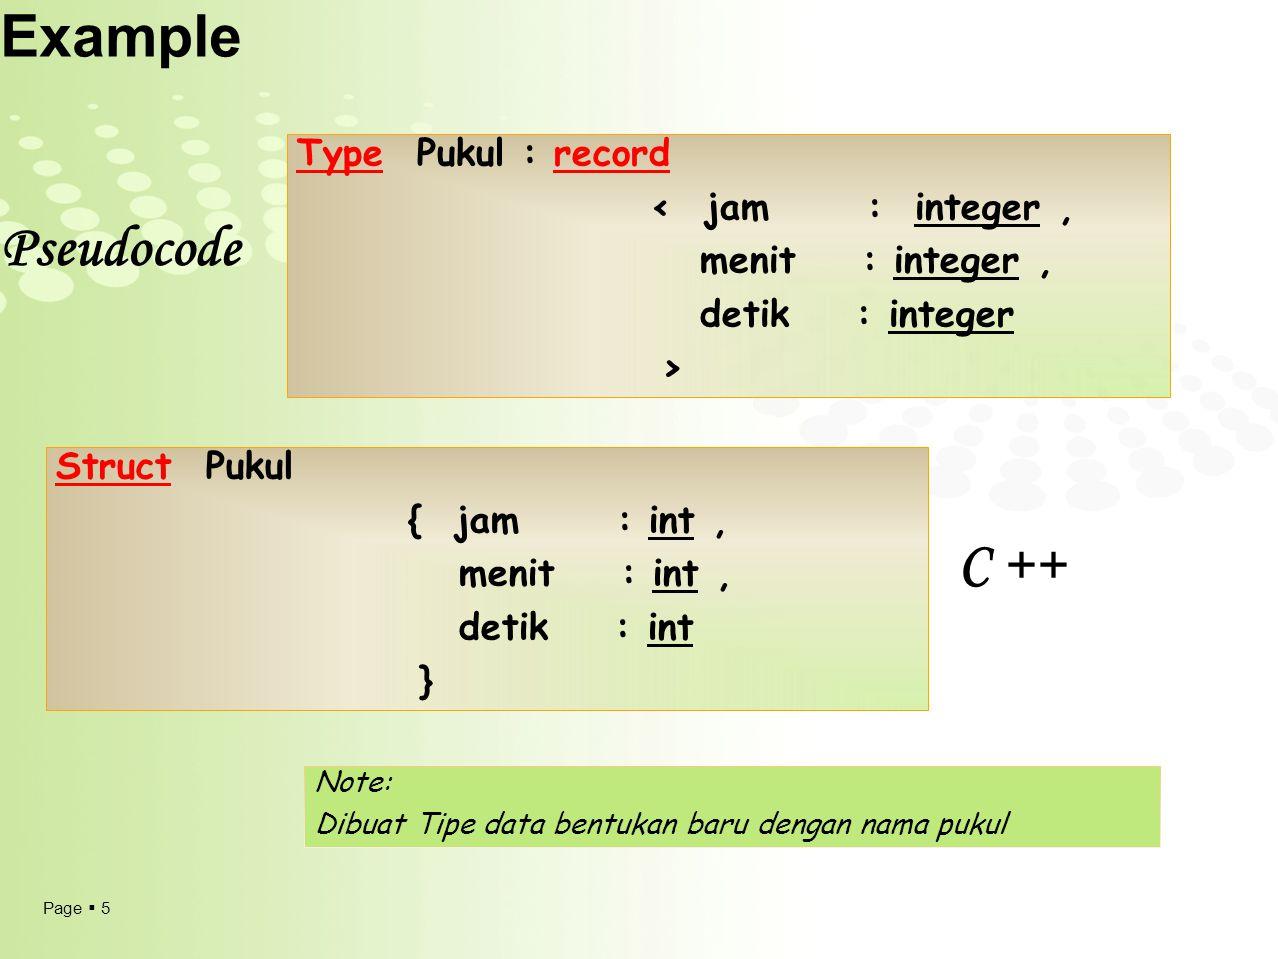 Page  5 Example Type Pukul : record < jam : integer, menit : integer, detik : integer > Struct Pukul { jam : int, menit : int, detik : int } Note: Di